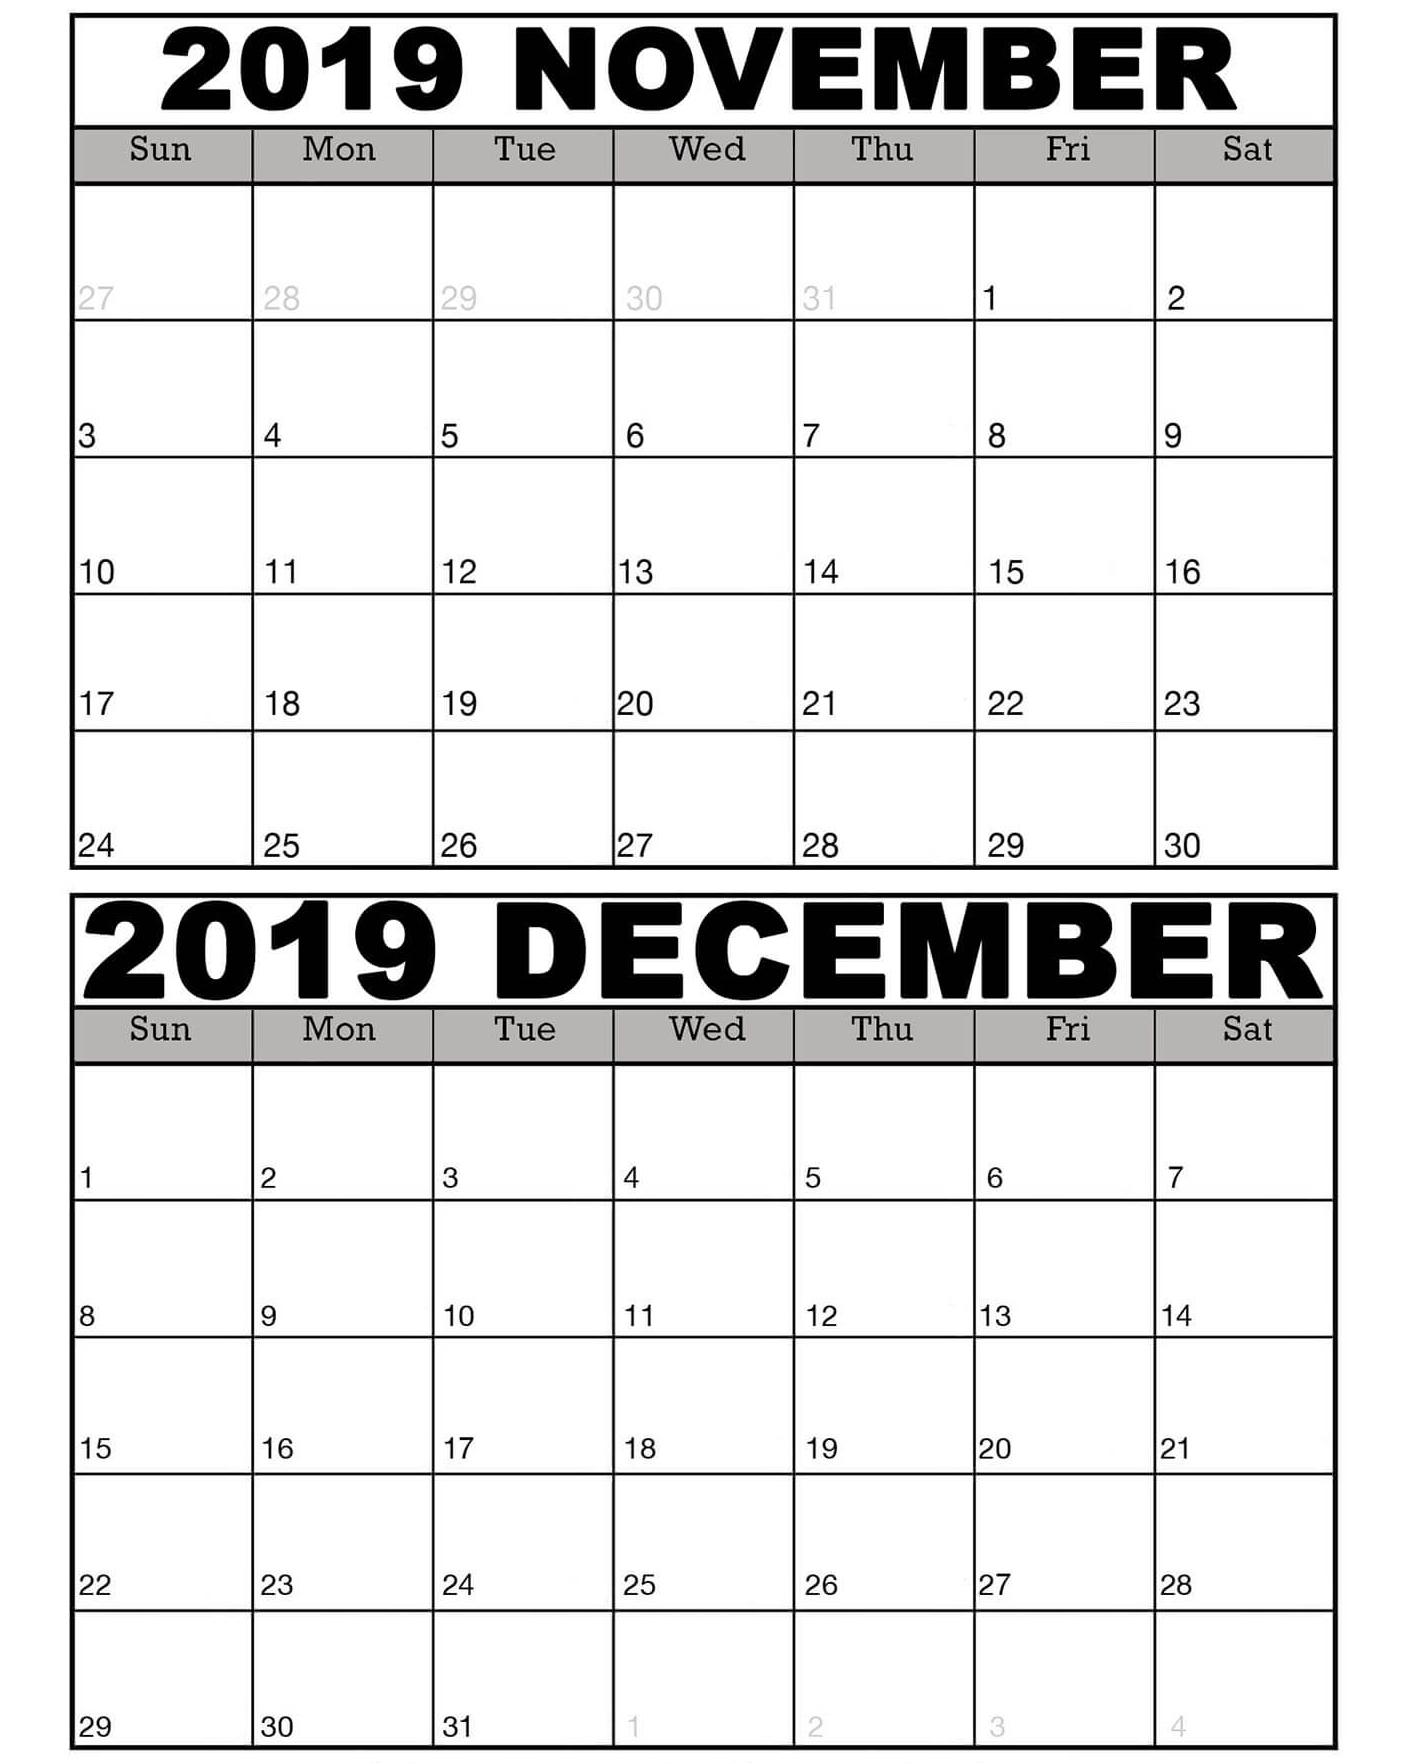 November And December 2019 Calendar Template - 2019